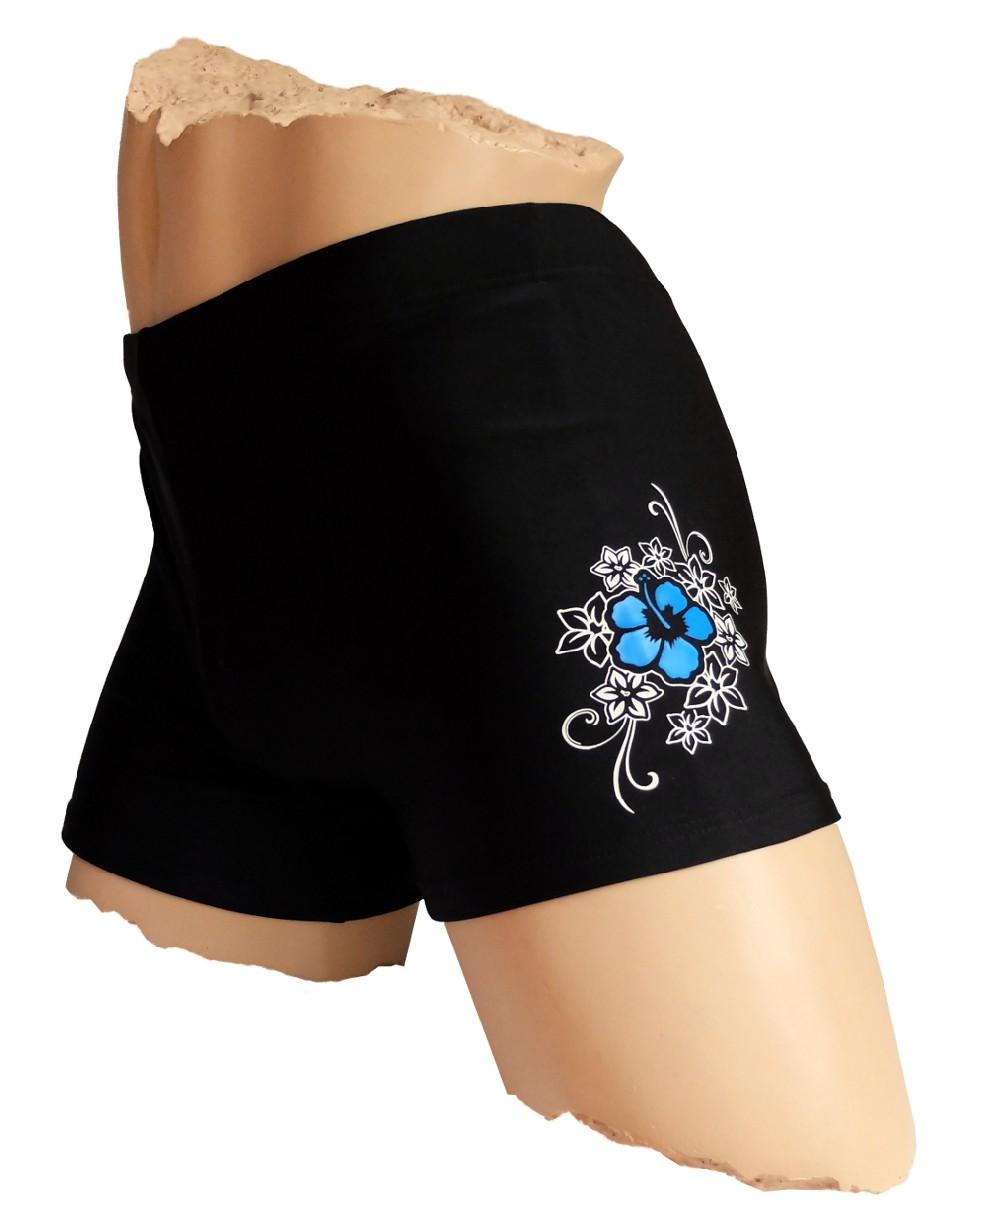 sun project beachwear herren swimshort pants badehose gr m l xl xxl ebay. Black Bedroom Furniture Sets. Home Design Ideas